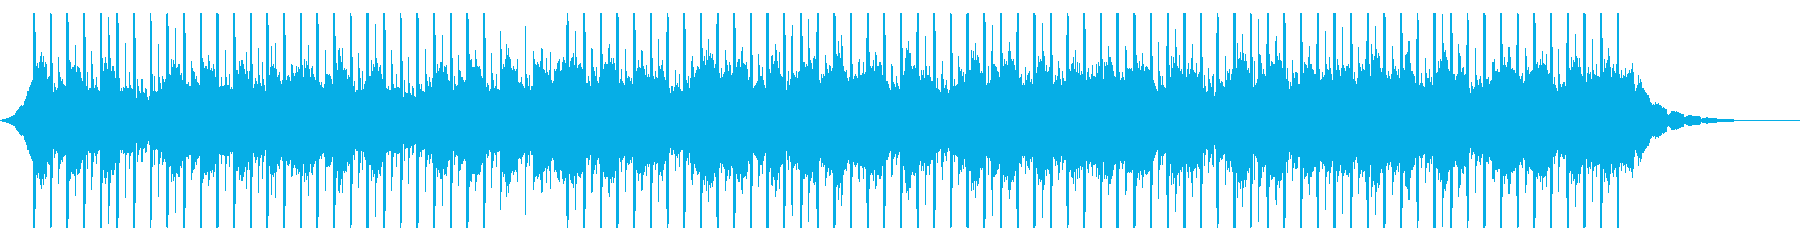 The Construction (60 Sec)'s reproduced waveform